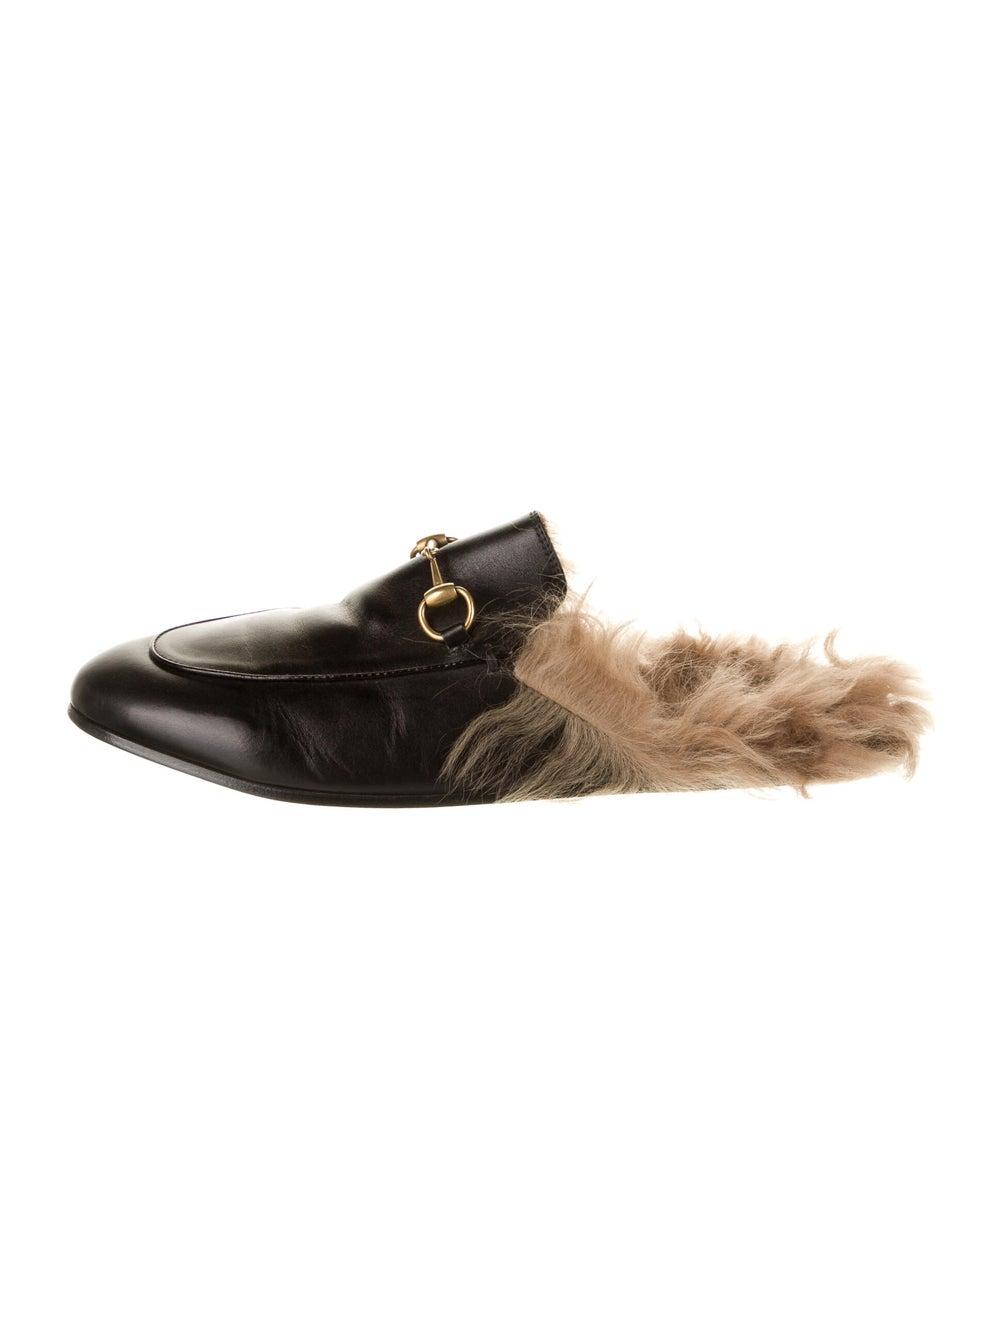 Gucci Princetown Horsebit Accent Mules Black - image 1